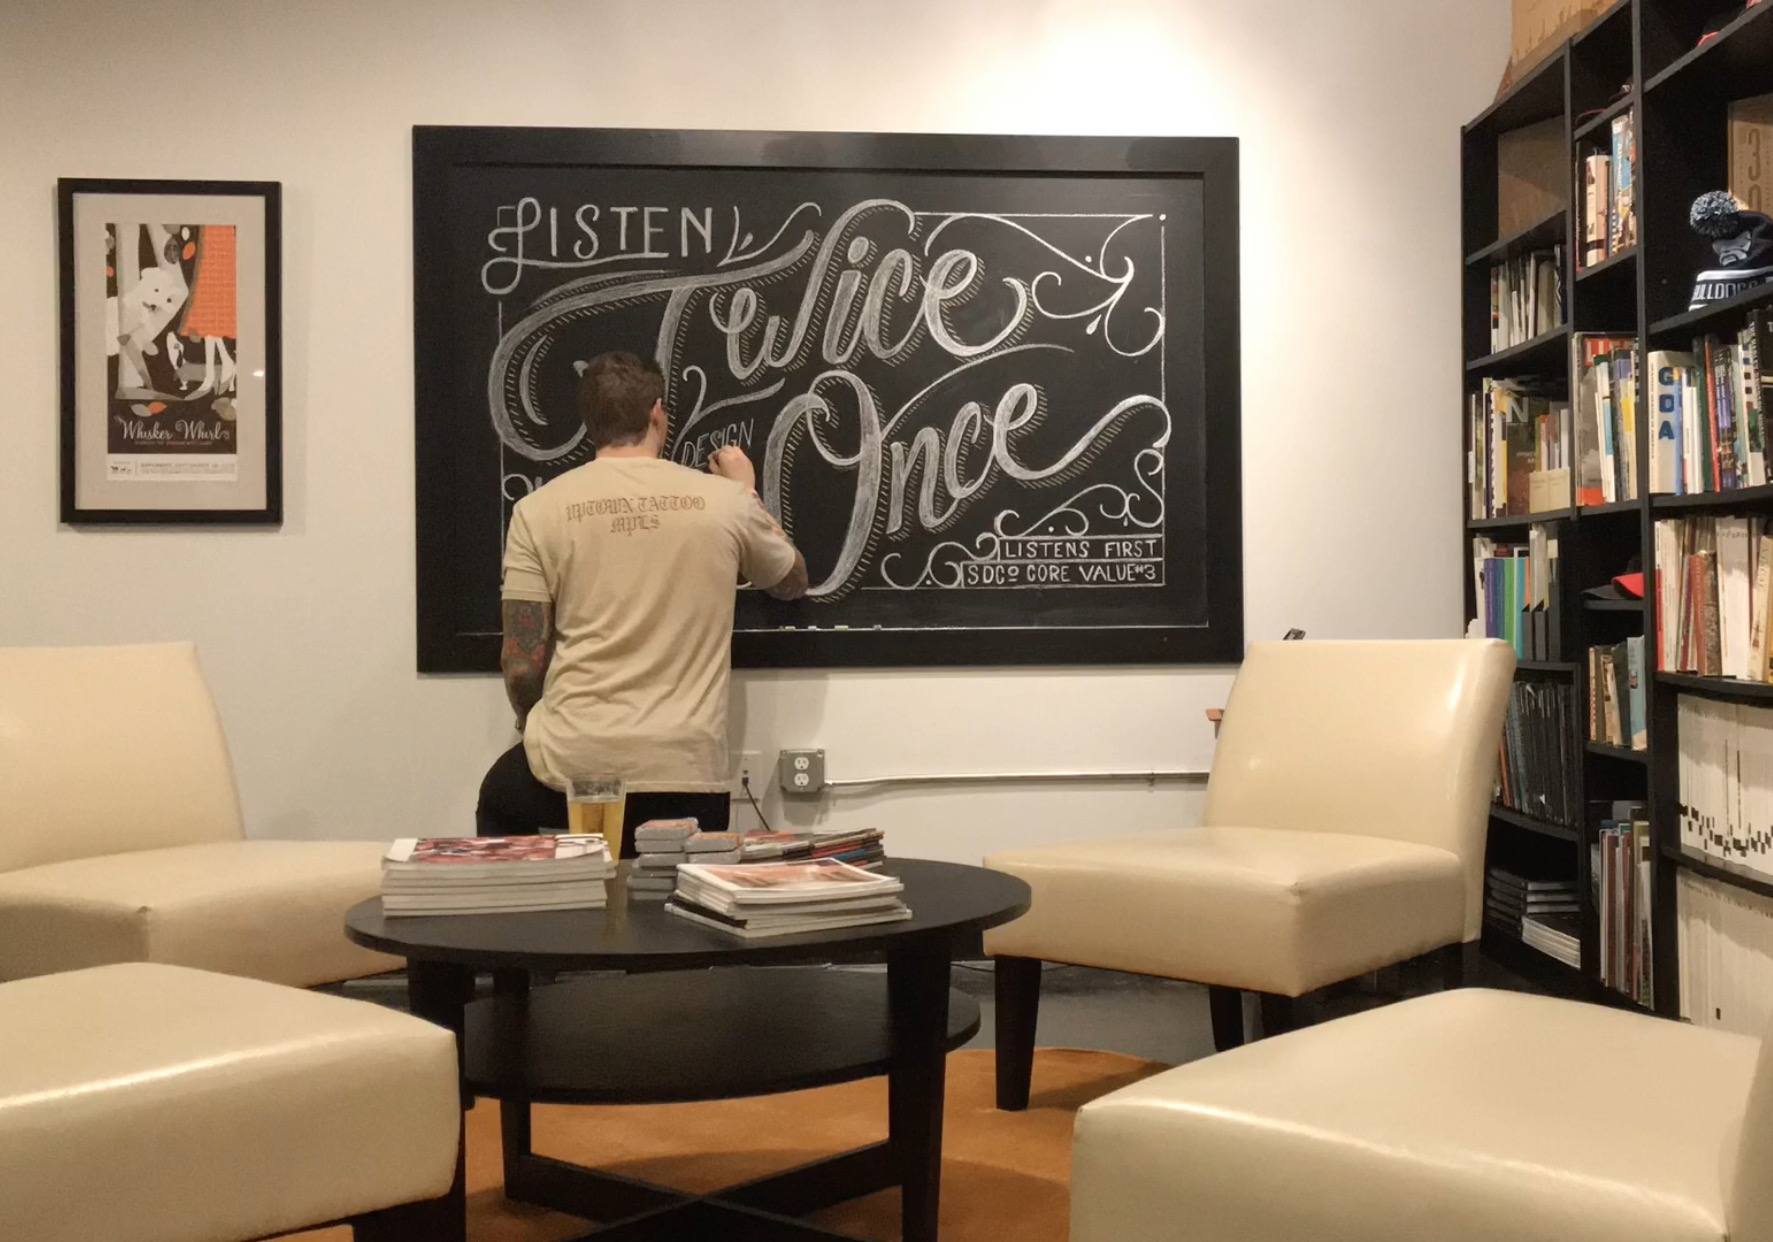 Core Value #3 – Listens First. Chalkboard Lettering